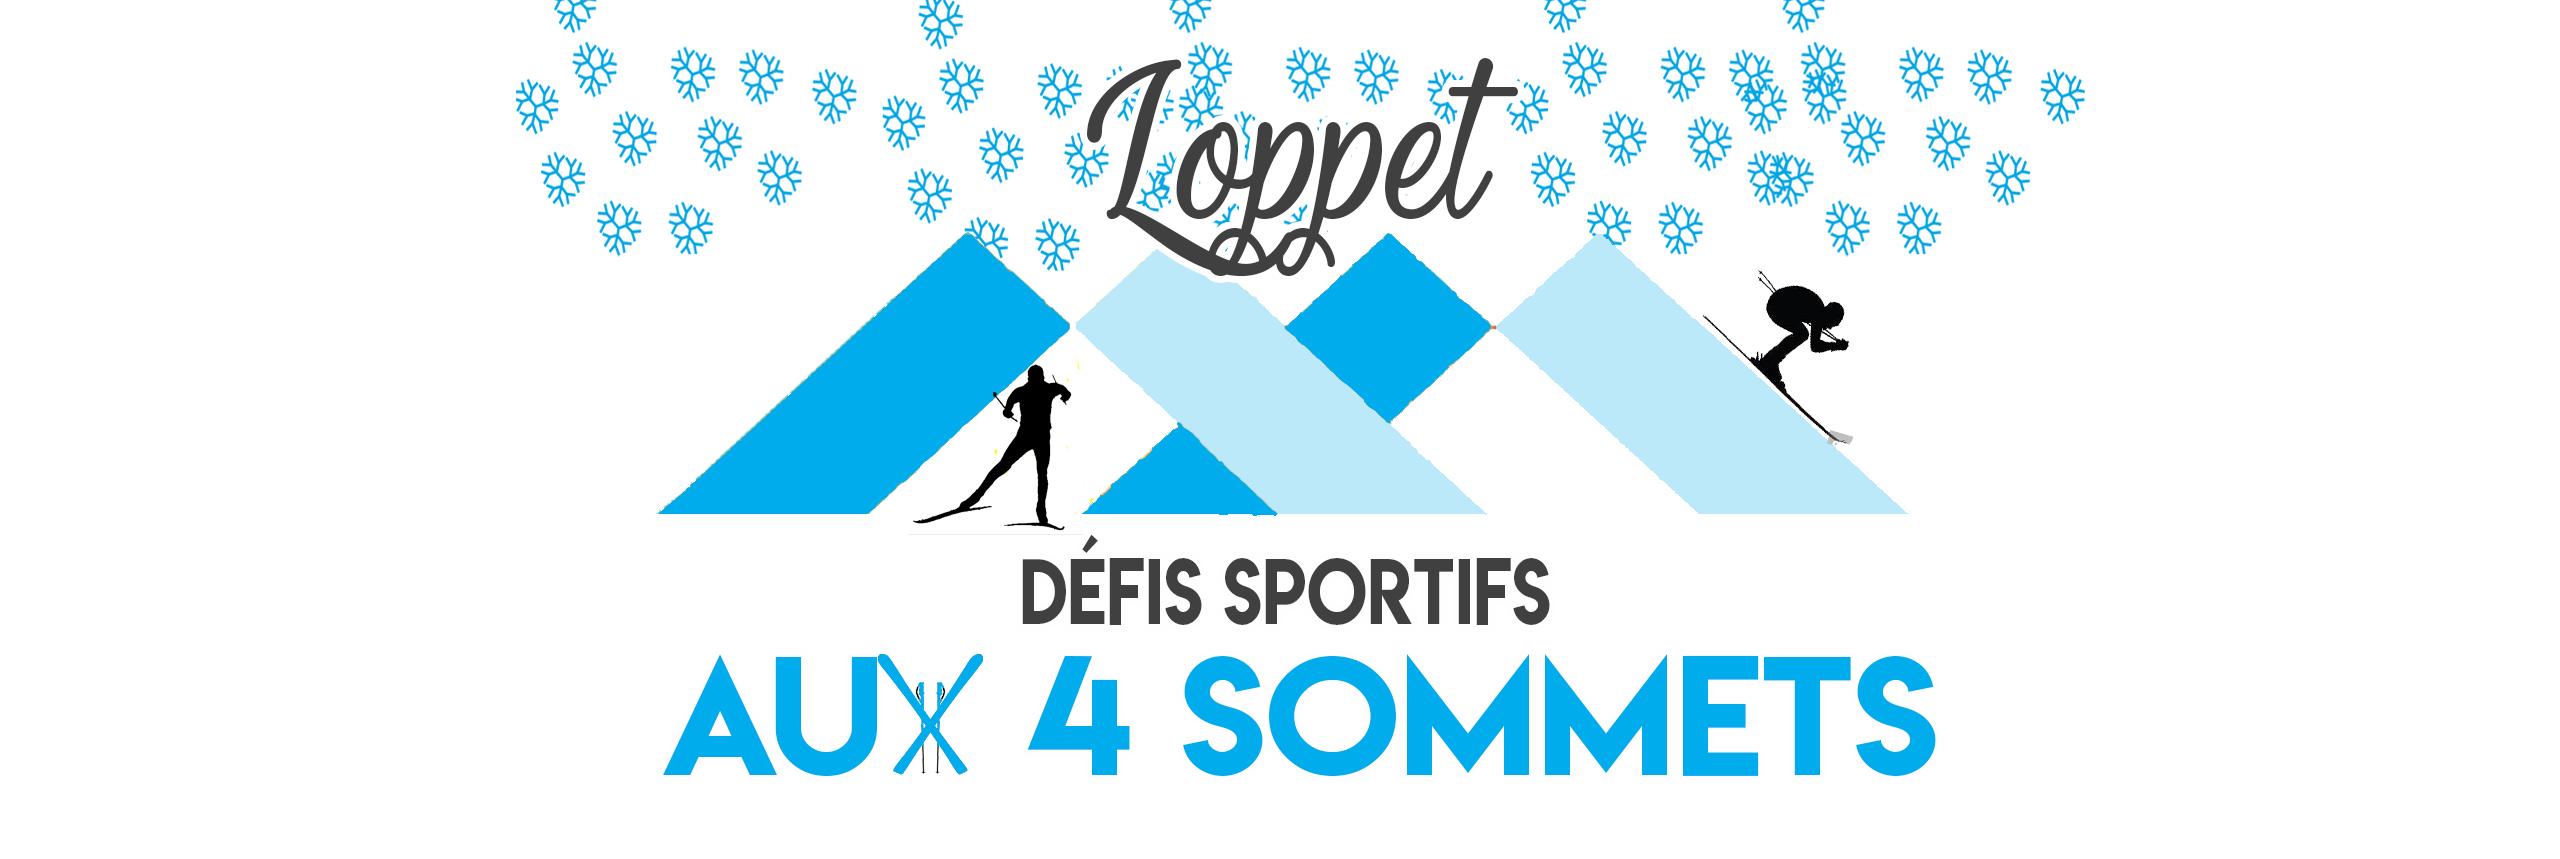 https://www.aux4sommets.com/wp-content/uploads/2014/05/logo-upload-fini.png